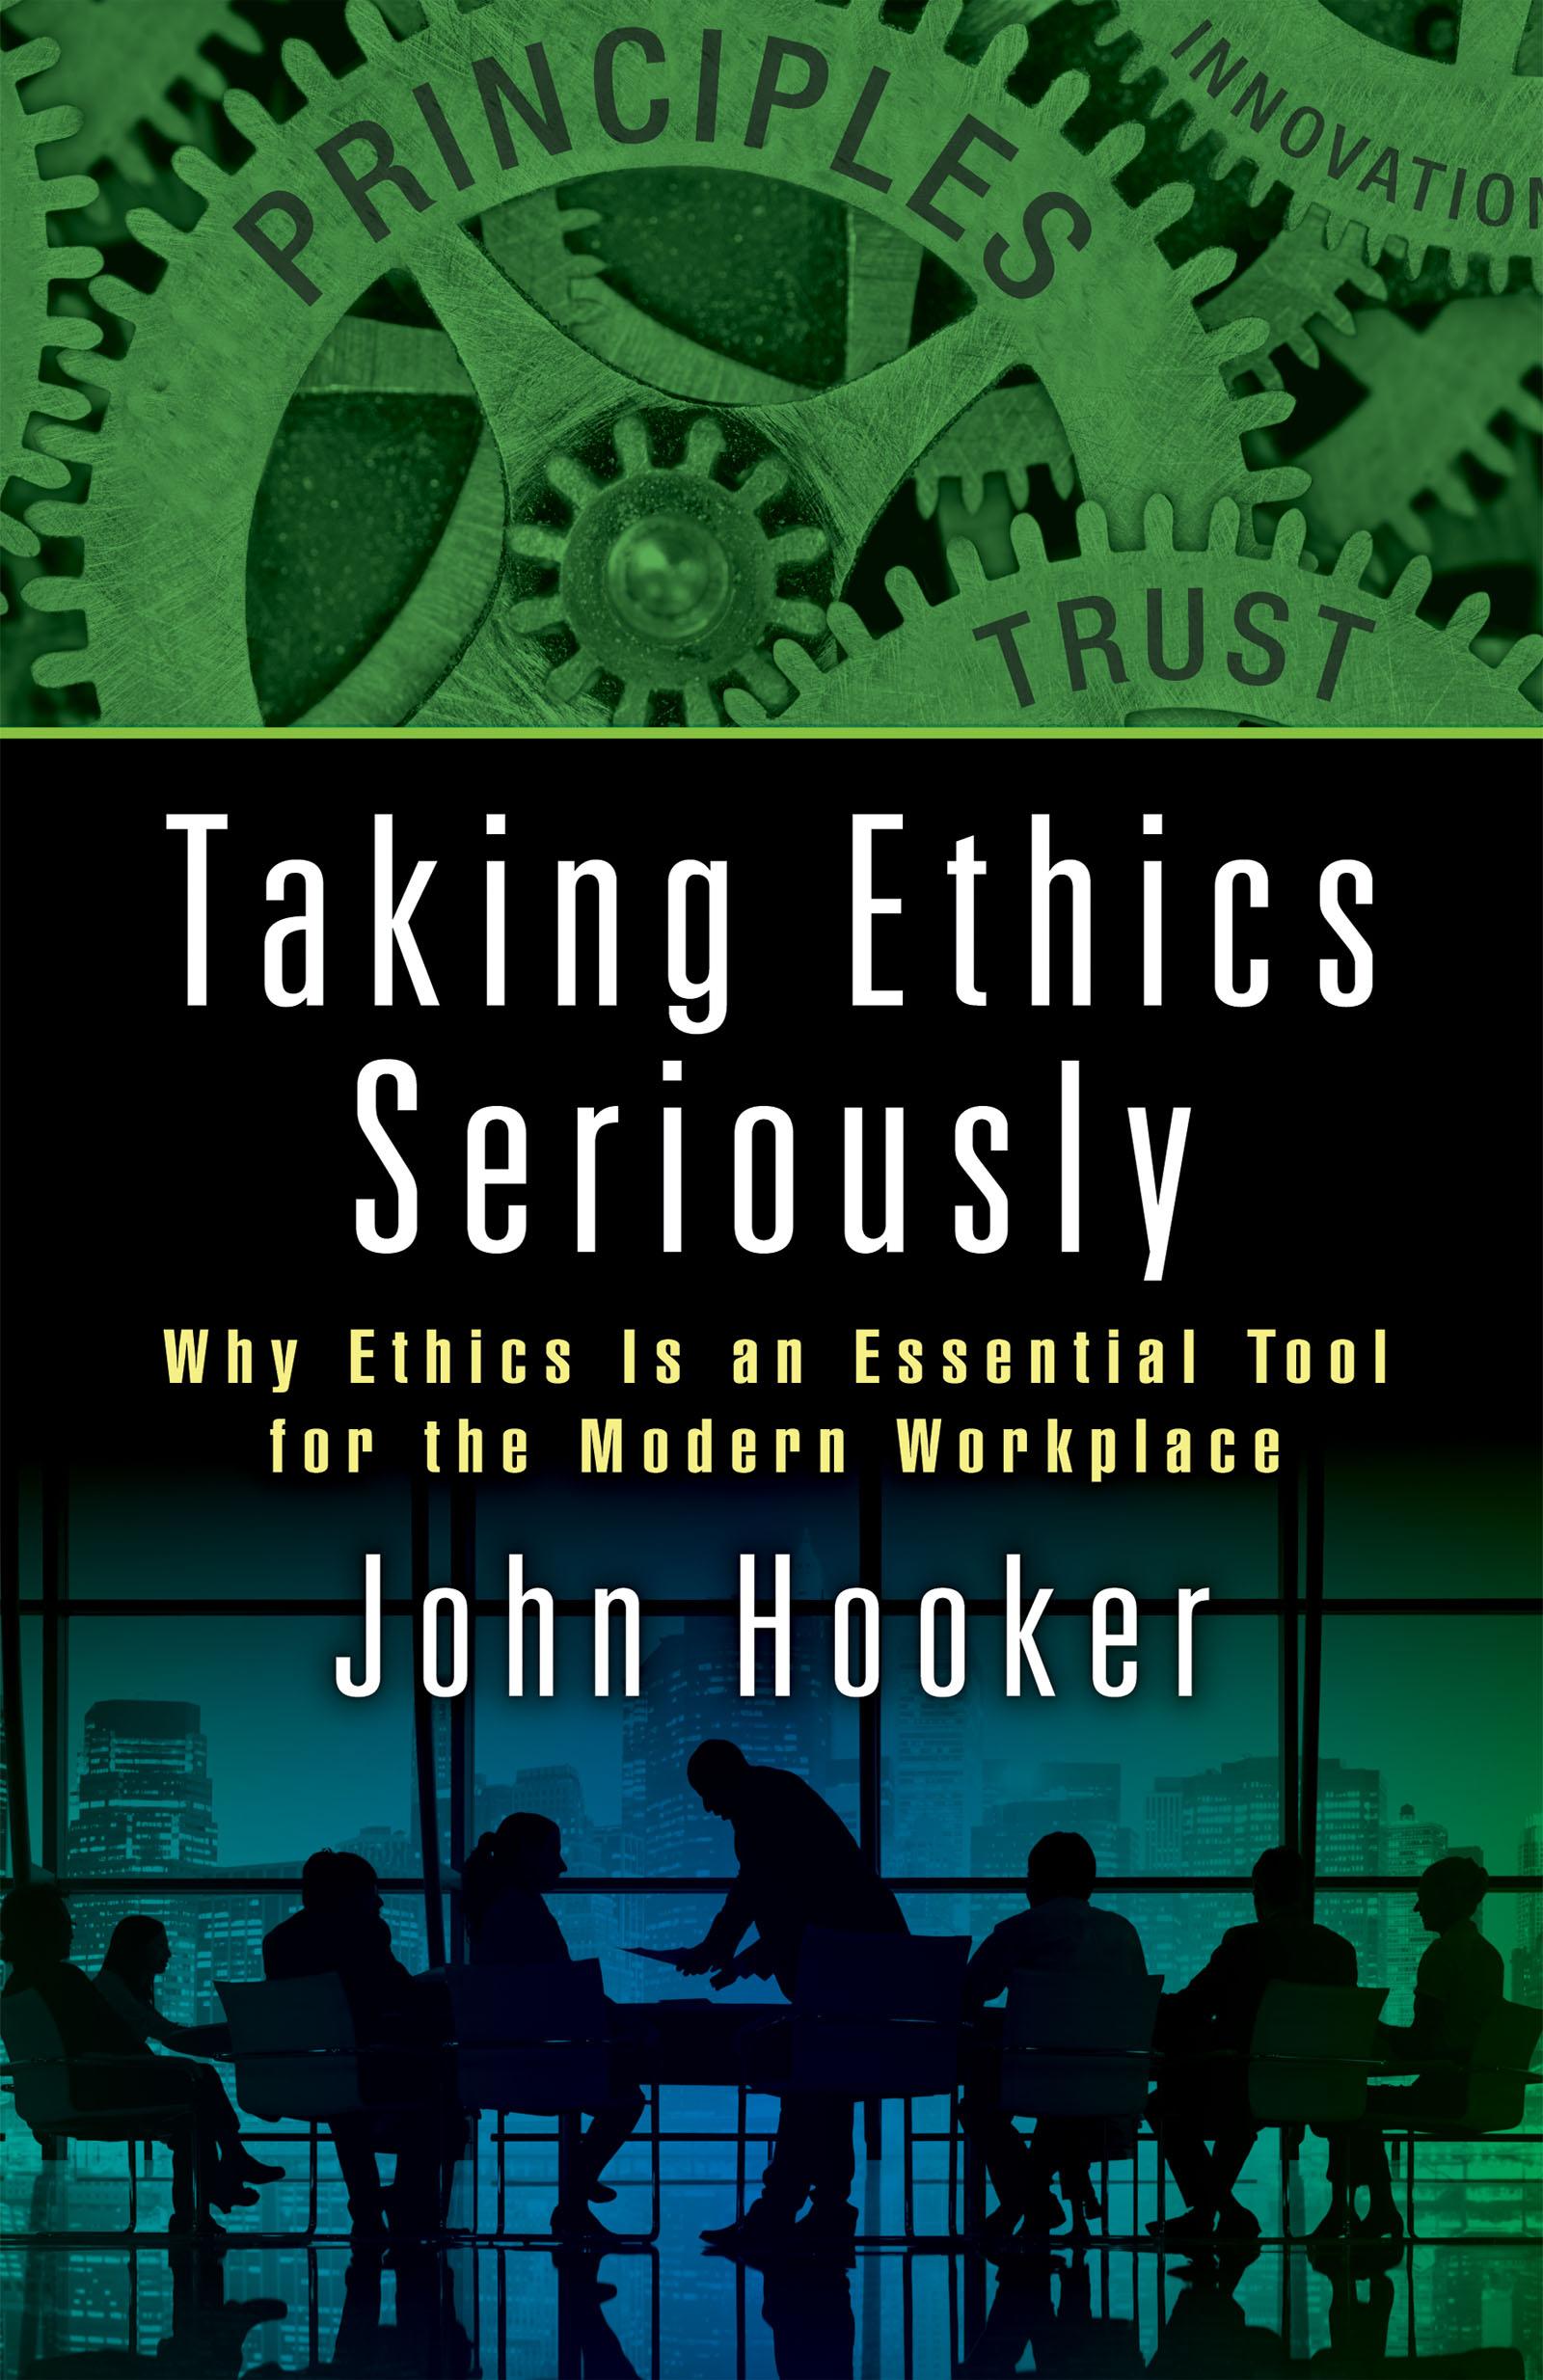 Taking Ethics Seriously